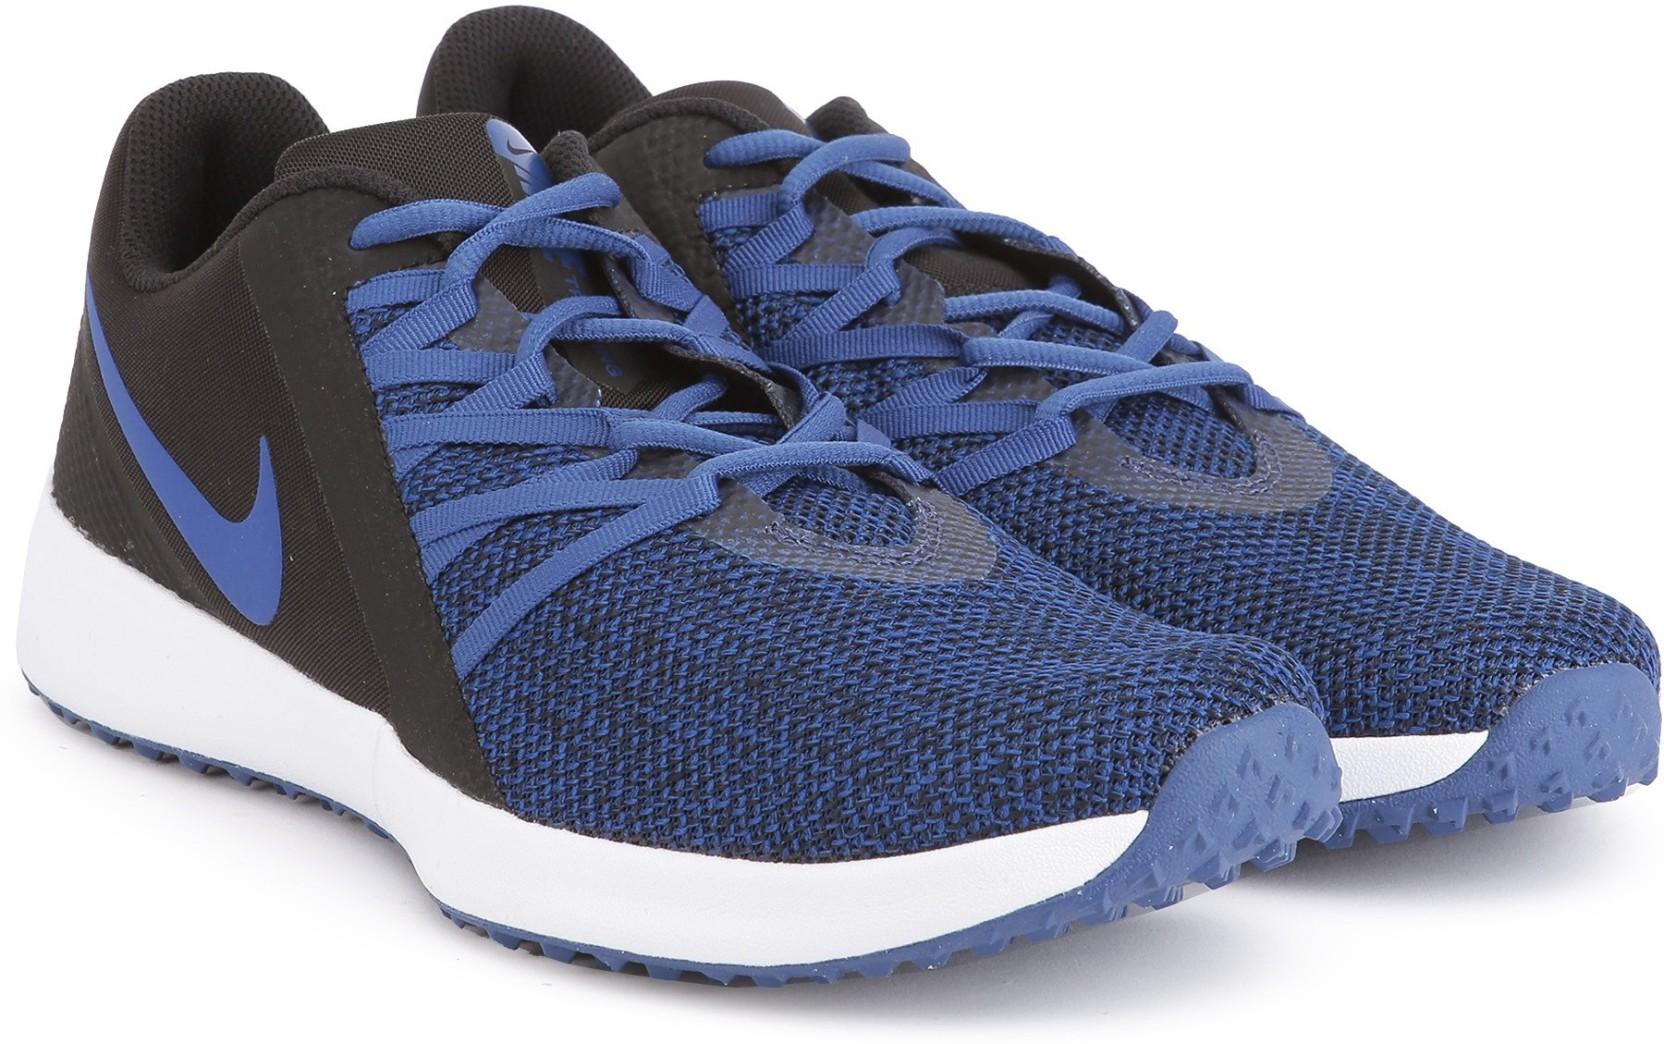 huge discount c43a0 37d9c Nike NIKE VARSITY COMPETE TRAINER Trainer Shoes For Men (Black, Blue)